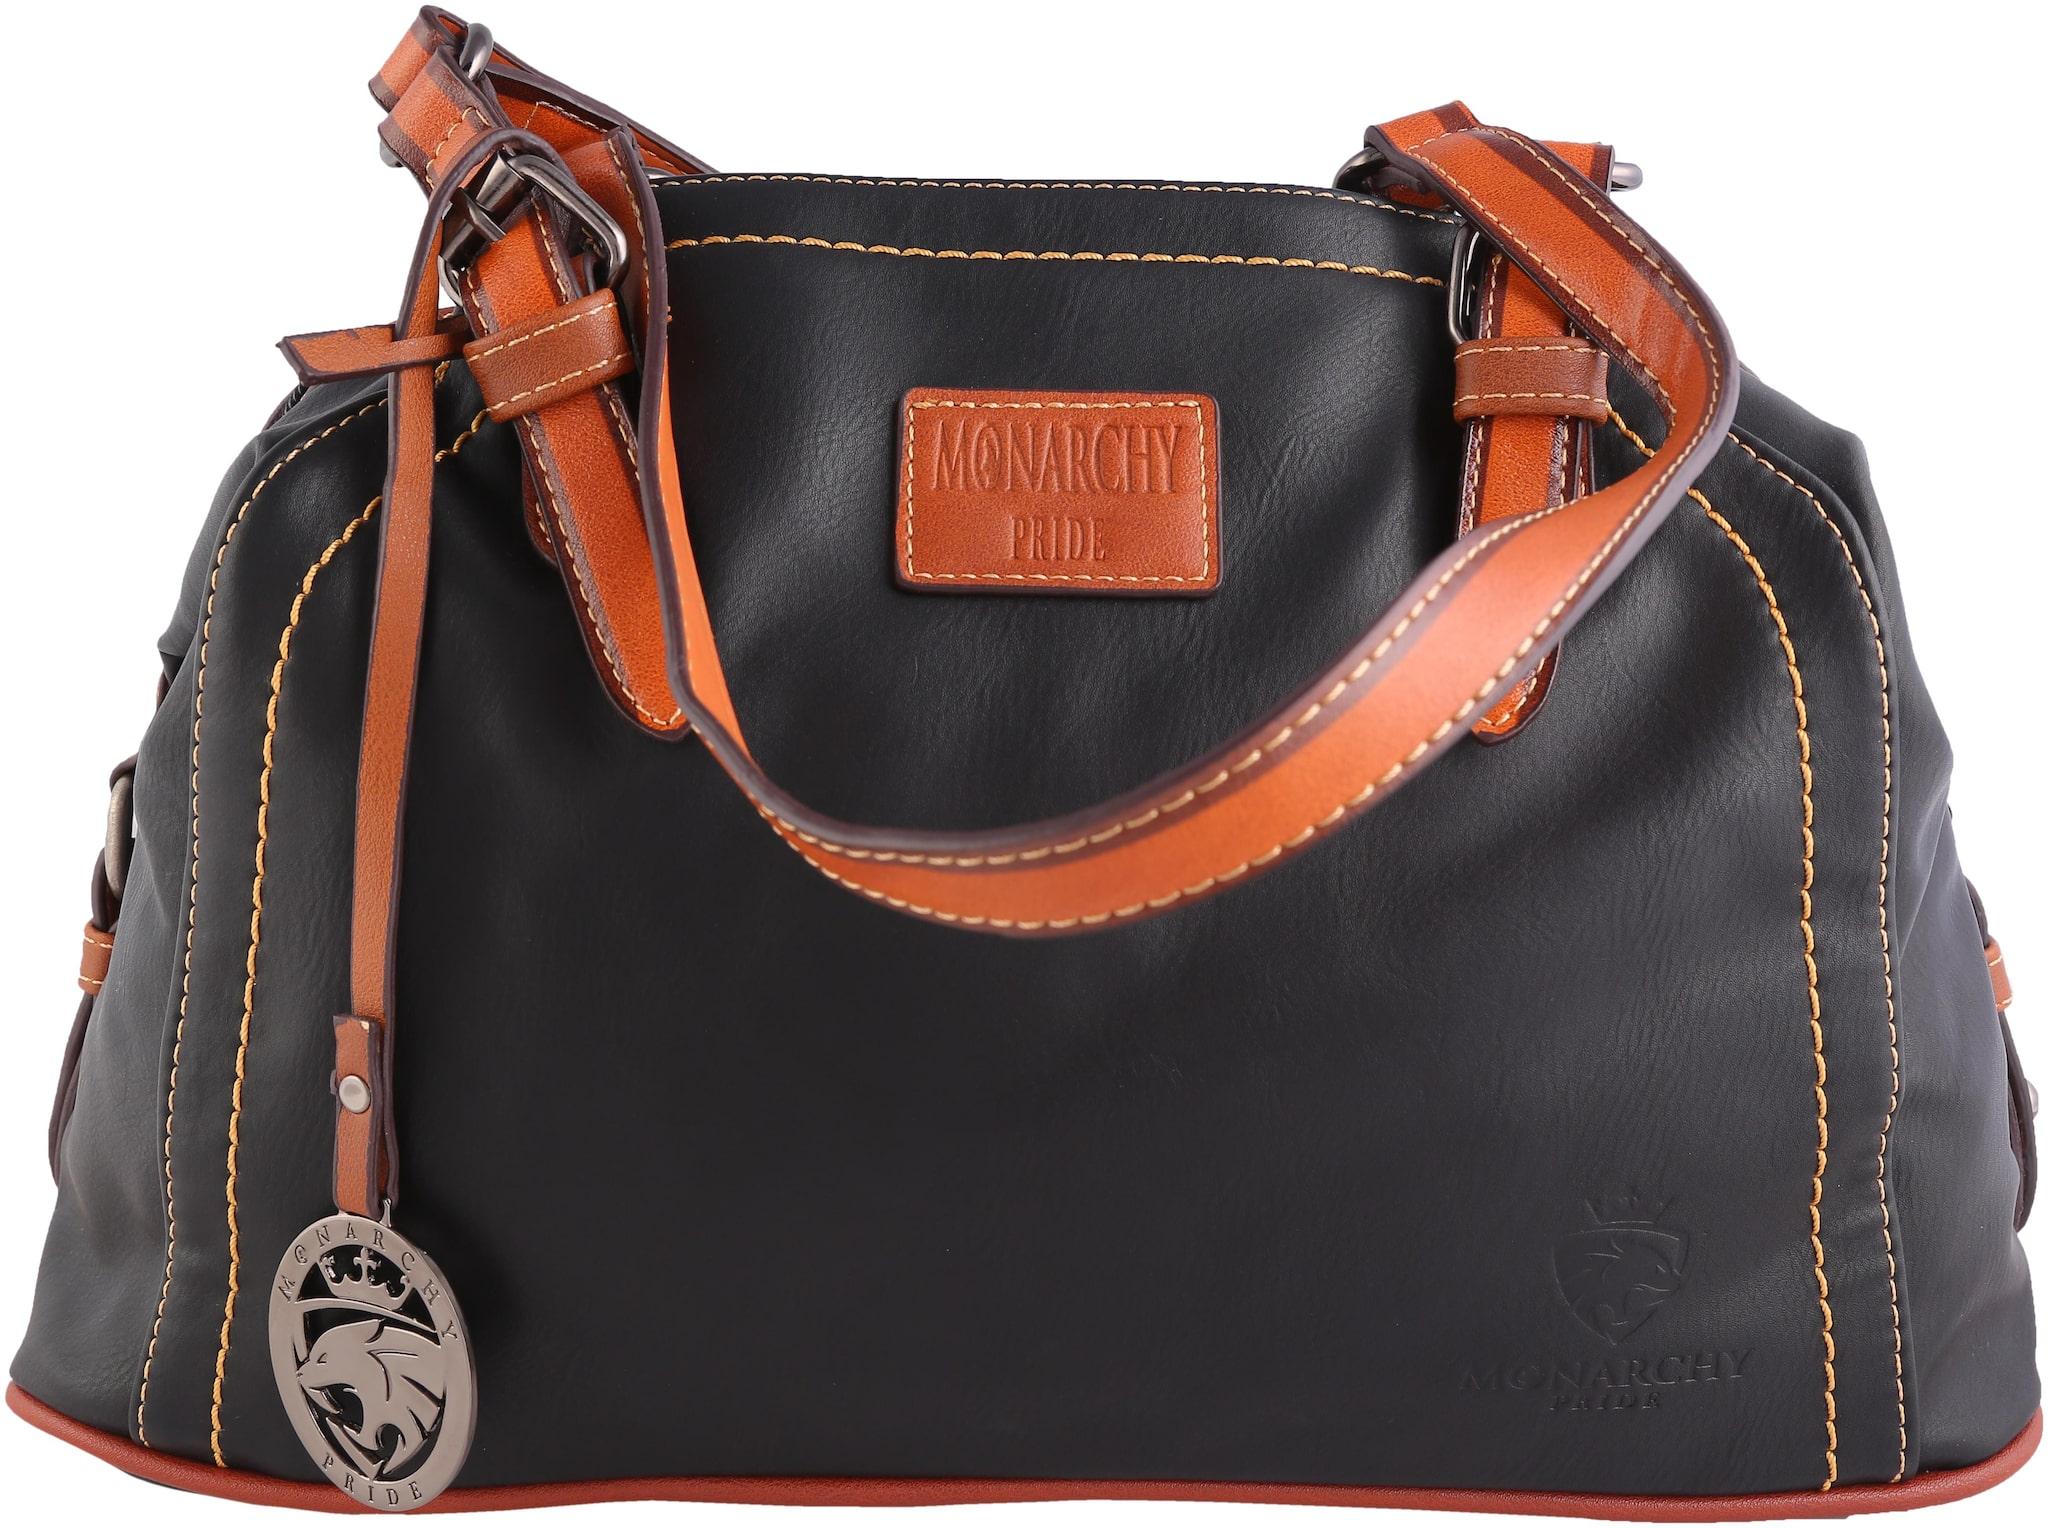 578cc6c0cb0 Ladies Handbags - Handbags for Women Online - Designer Shoulder Bags ...